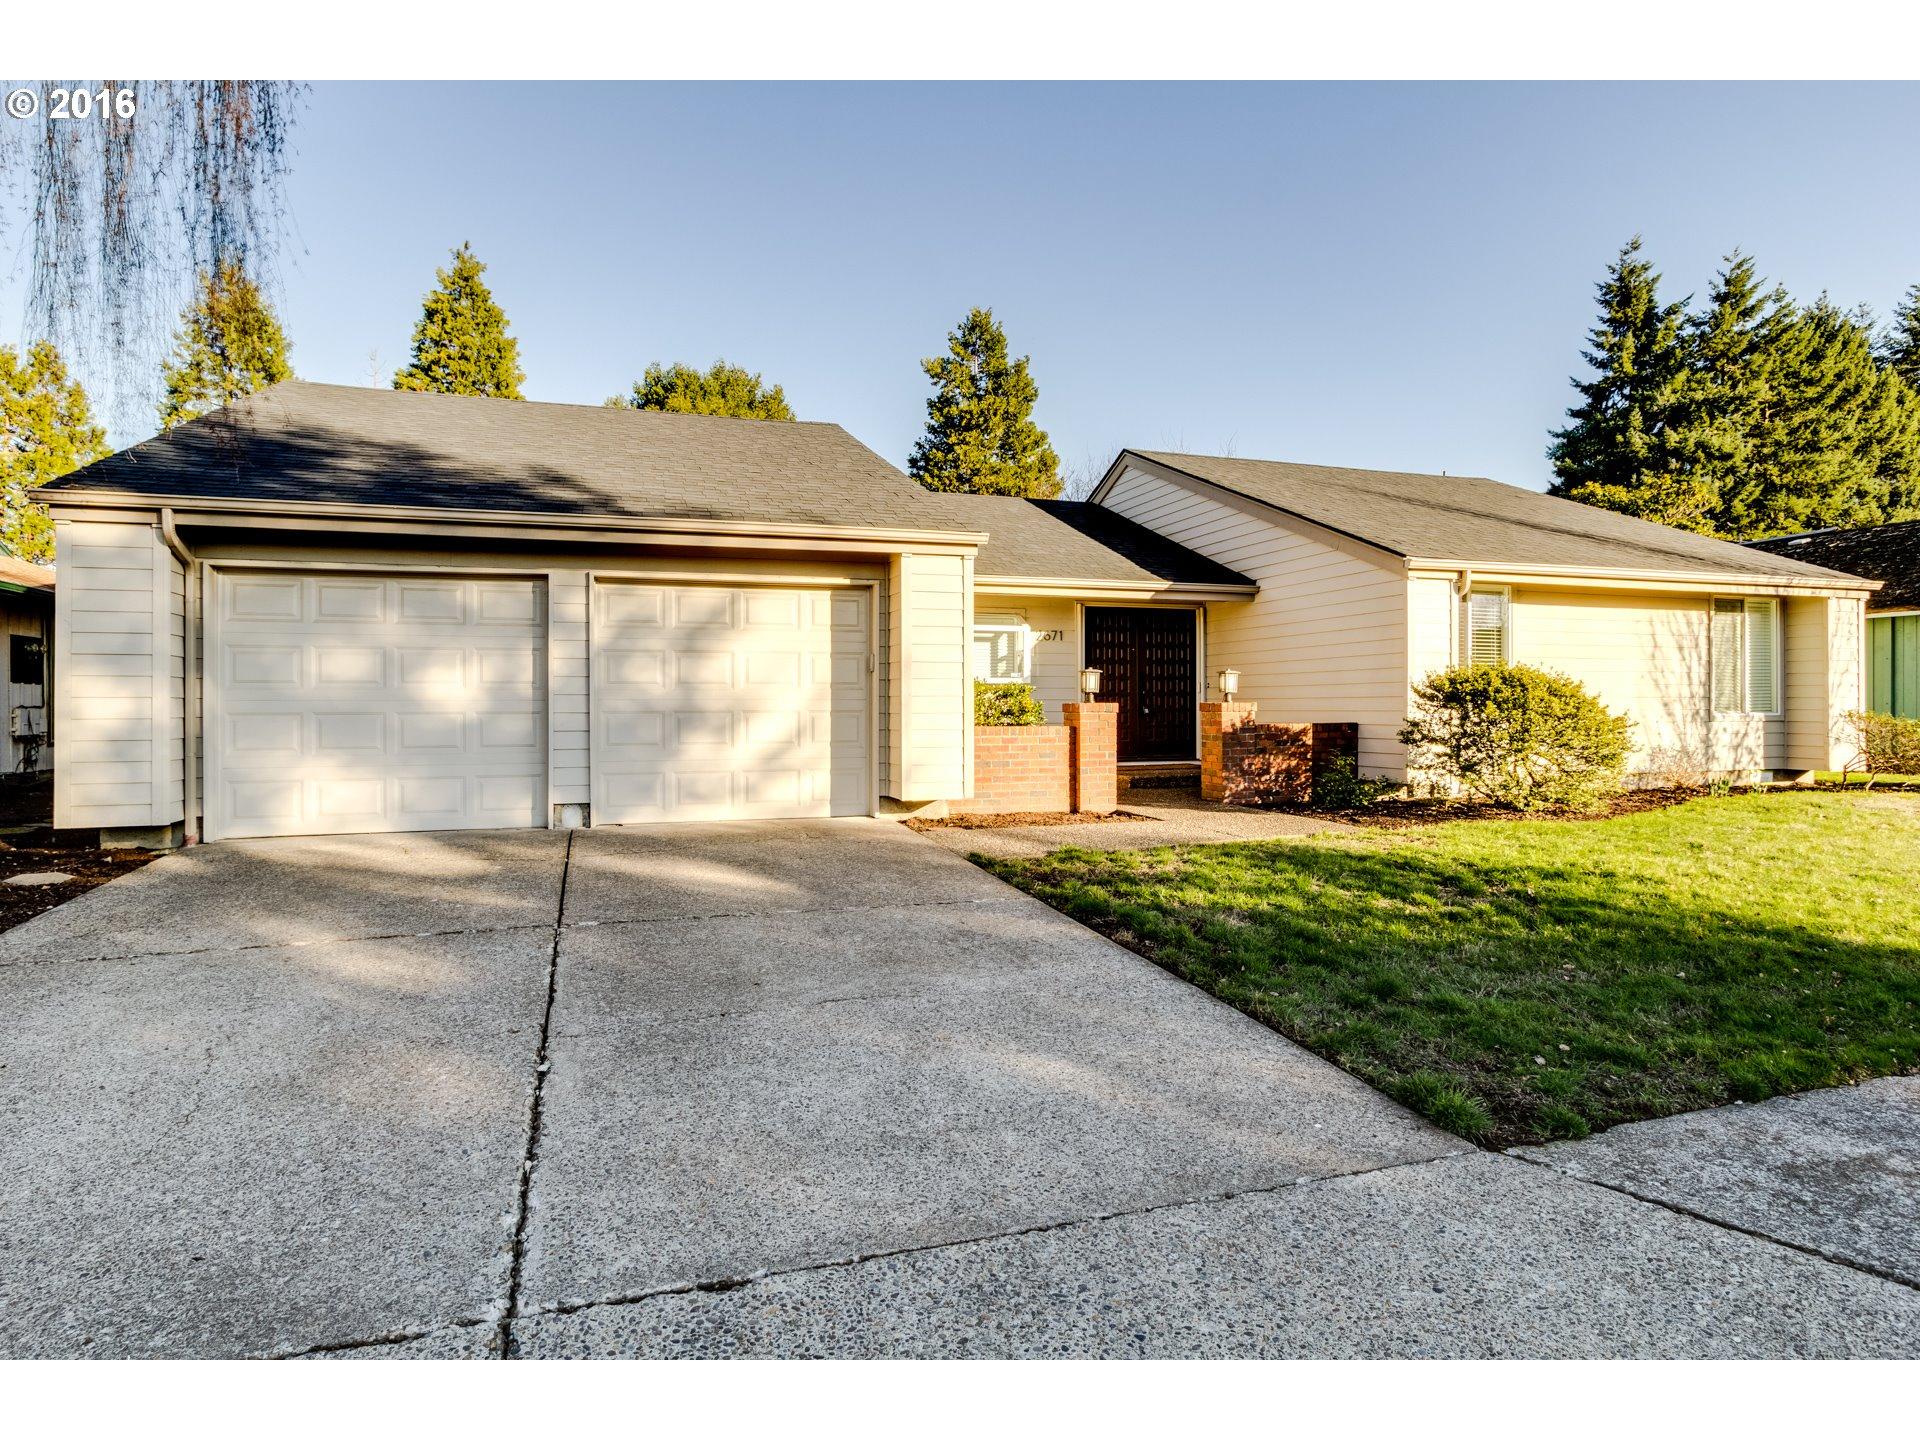 2671 Erin Way, Eugene, OR